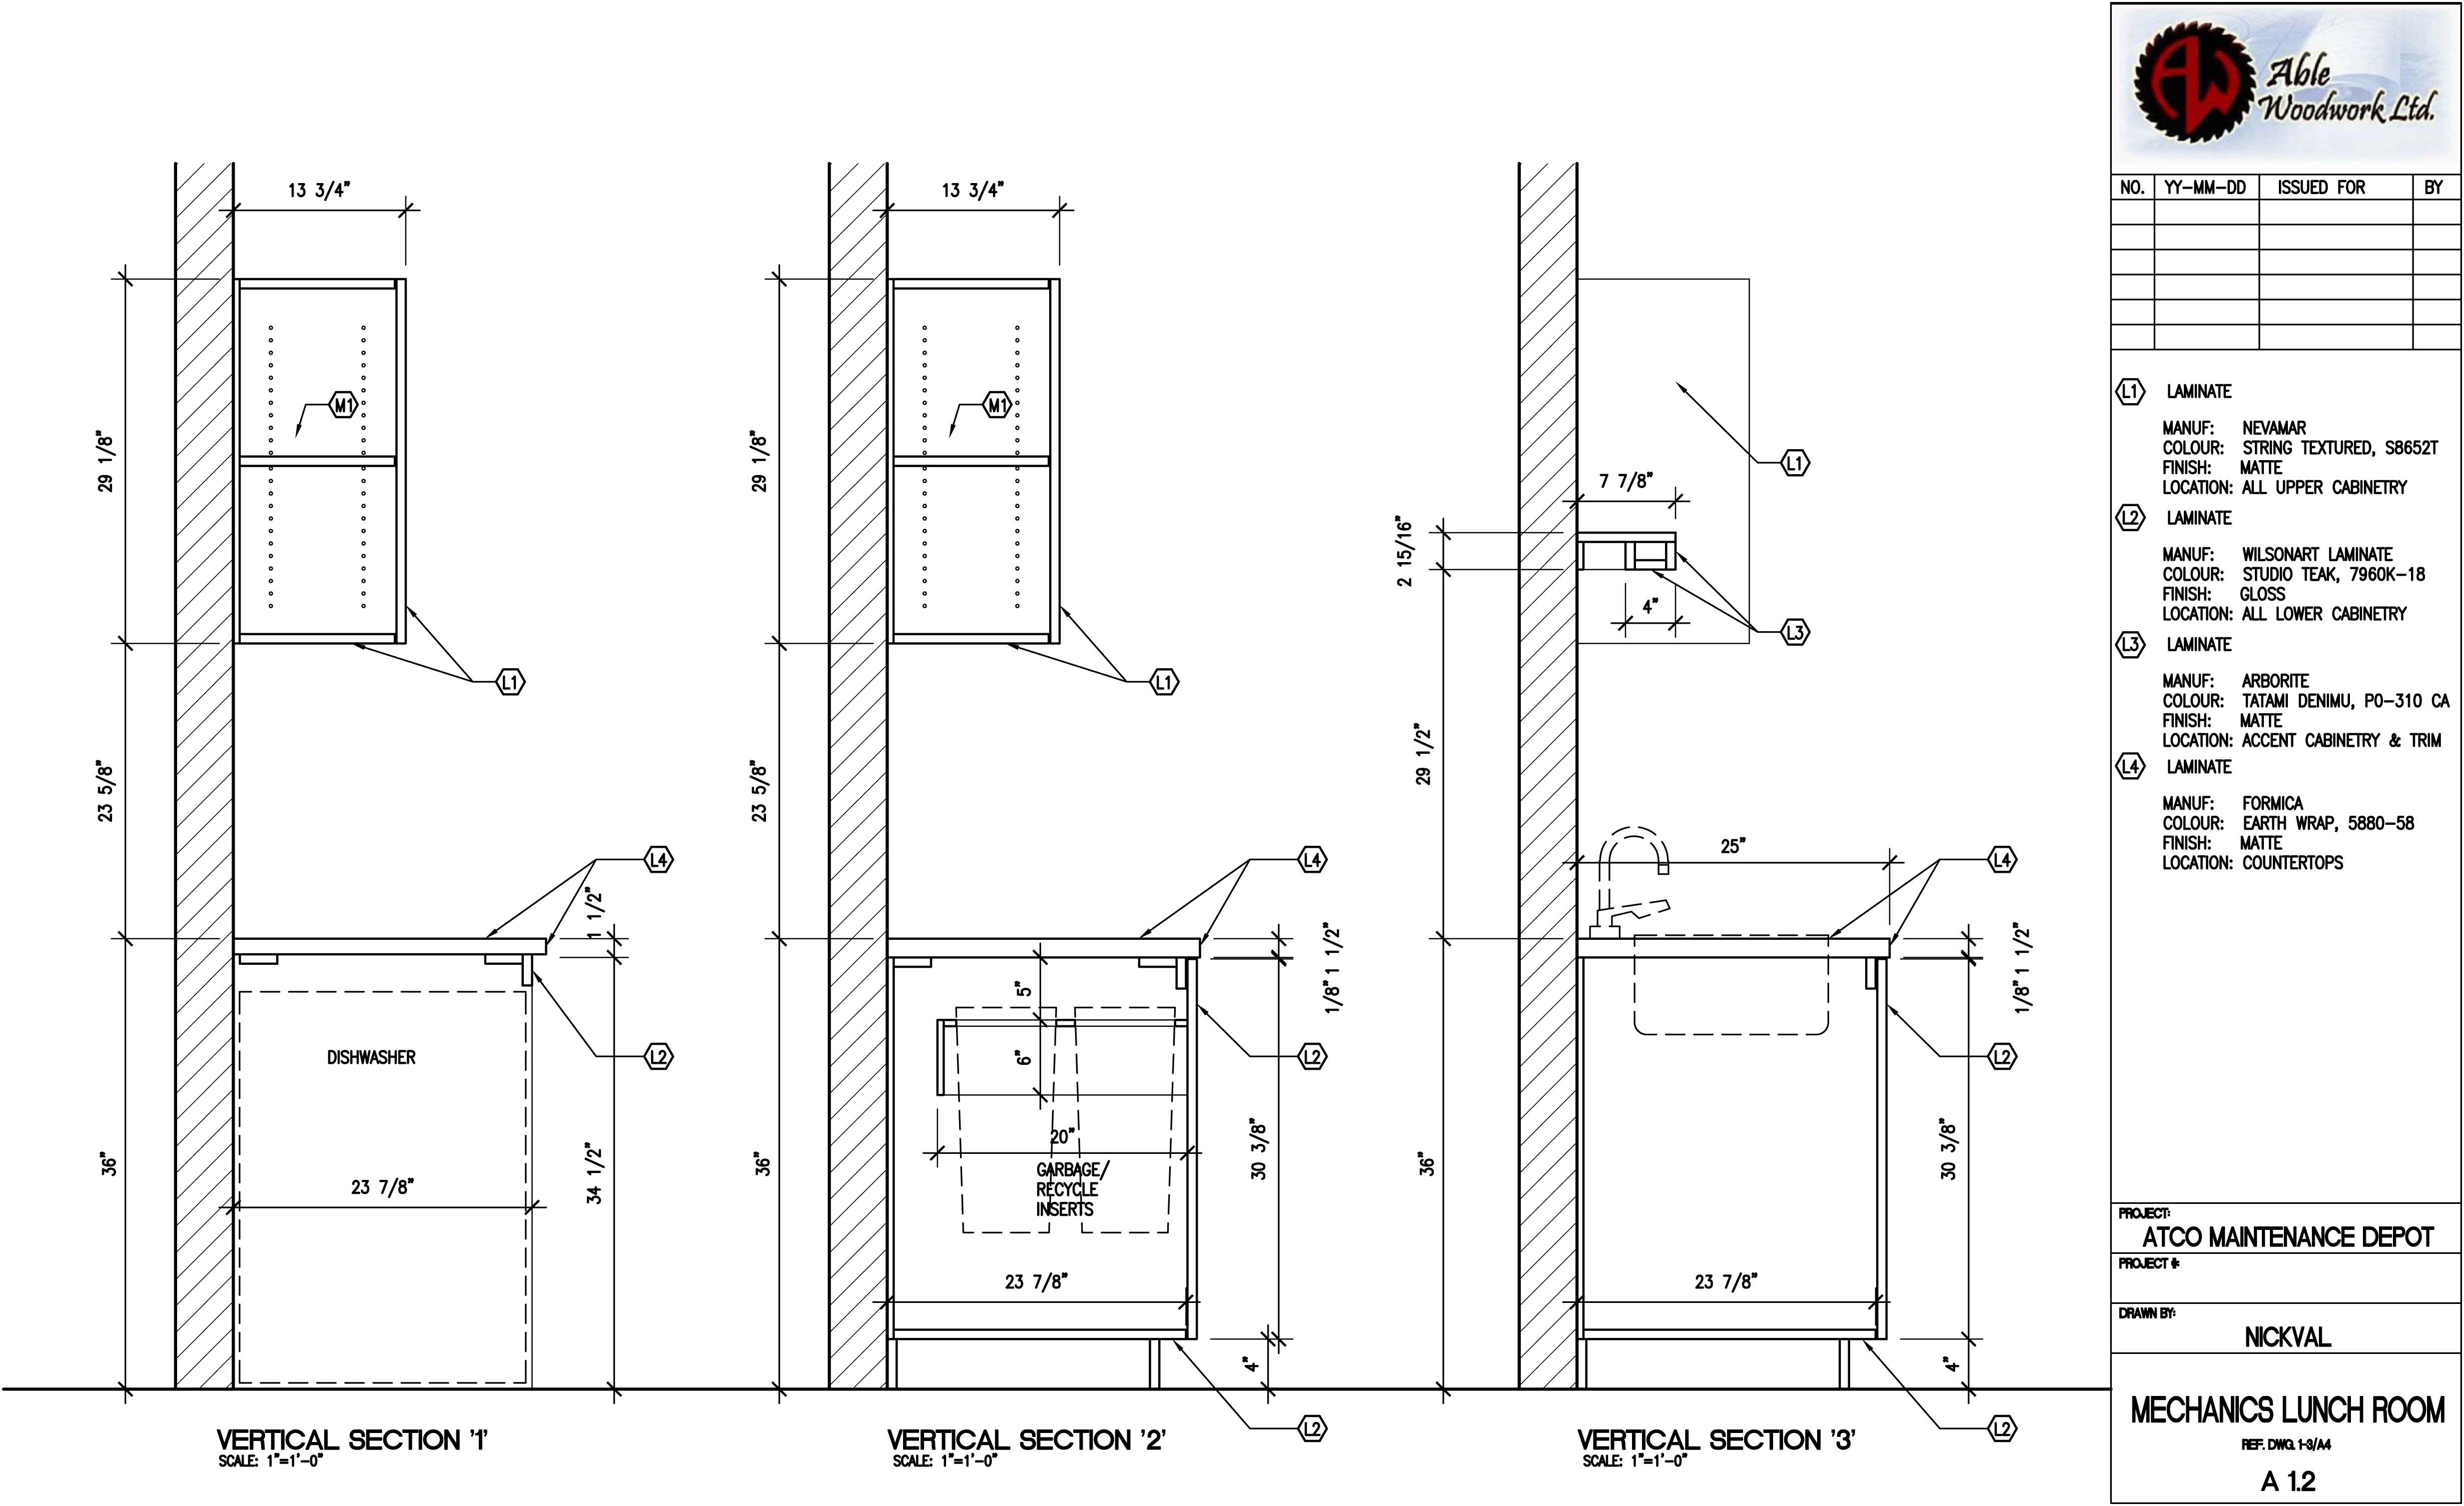 Drawing Hvac Systems Using Autocad Mep Auto Electrical Wiring Diagram Razer Lycosa Keyboard Usb Plug 1991 Ford 5 0 Engine 1998 Bmw Series 1987 Porsche 944 Fuse Box